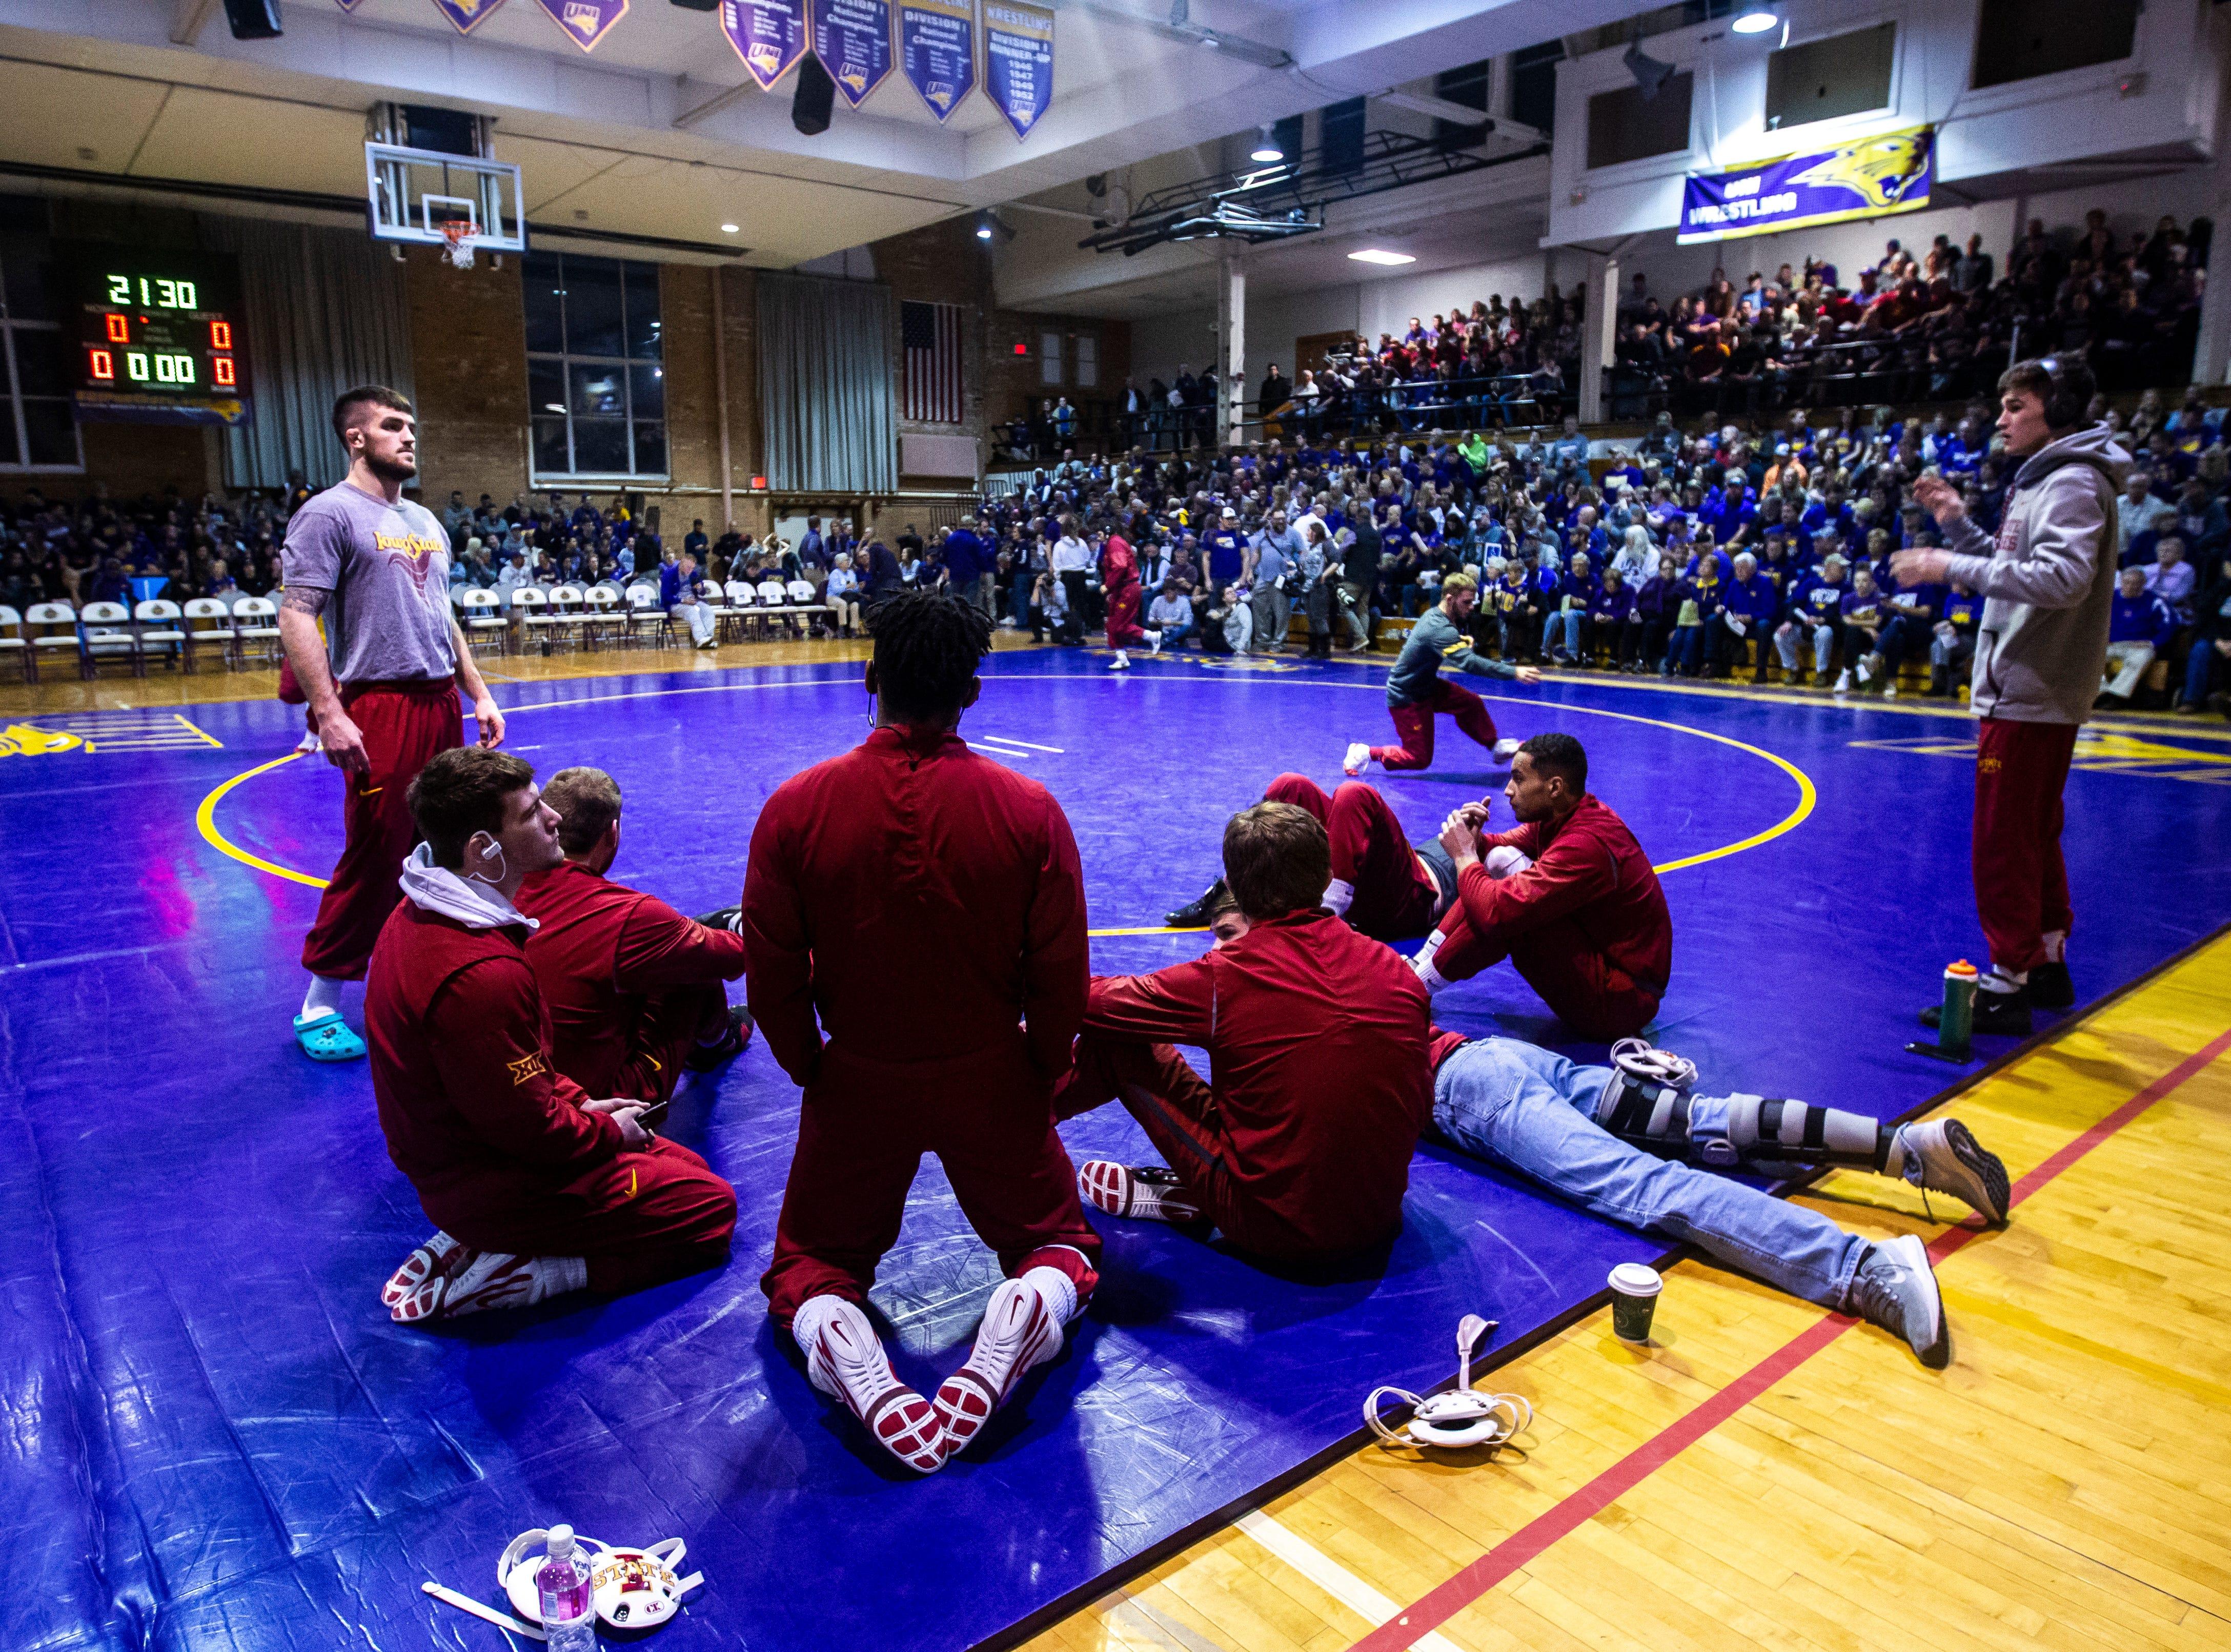 Iowa State senior Willie Miklus talks with teammates before a NCAA Big 12 wrestling dual on Thursday, Feb. 21, 2019 at the West Gymnasium in Cedar Falls, Iowa.